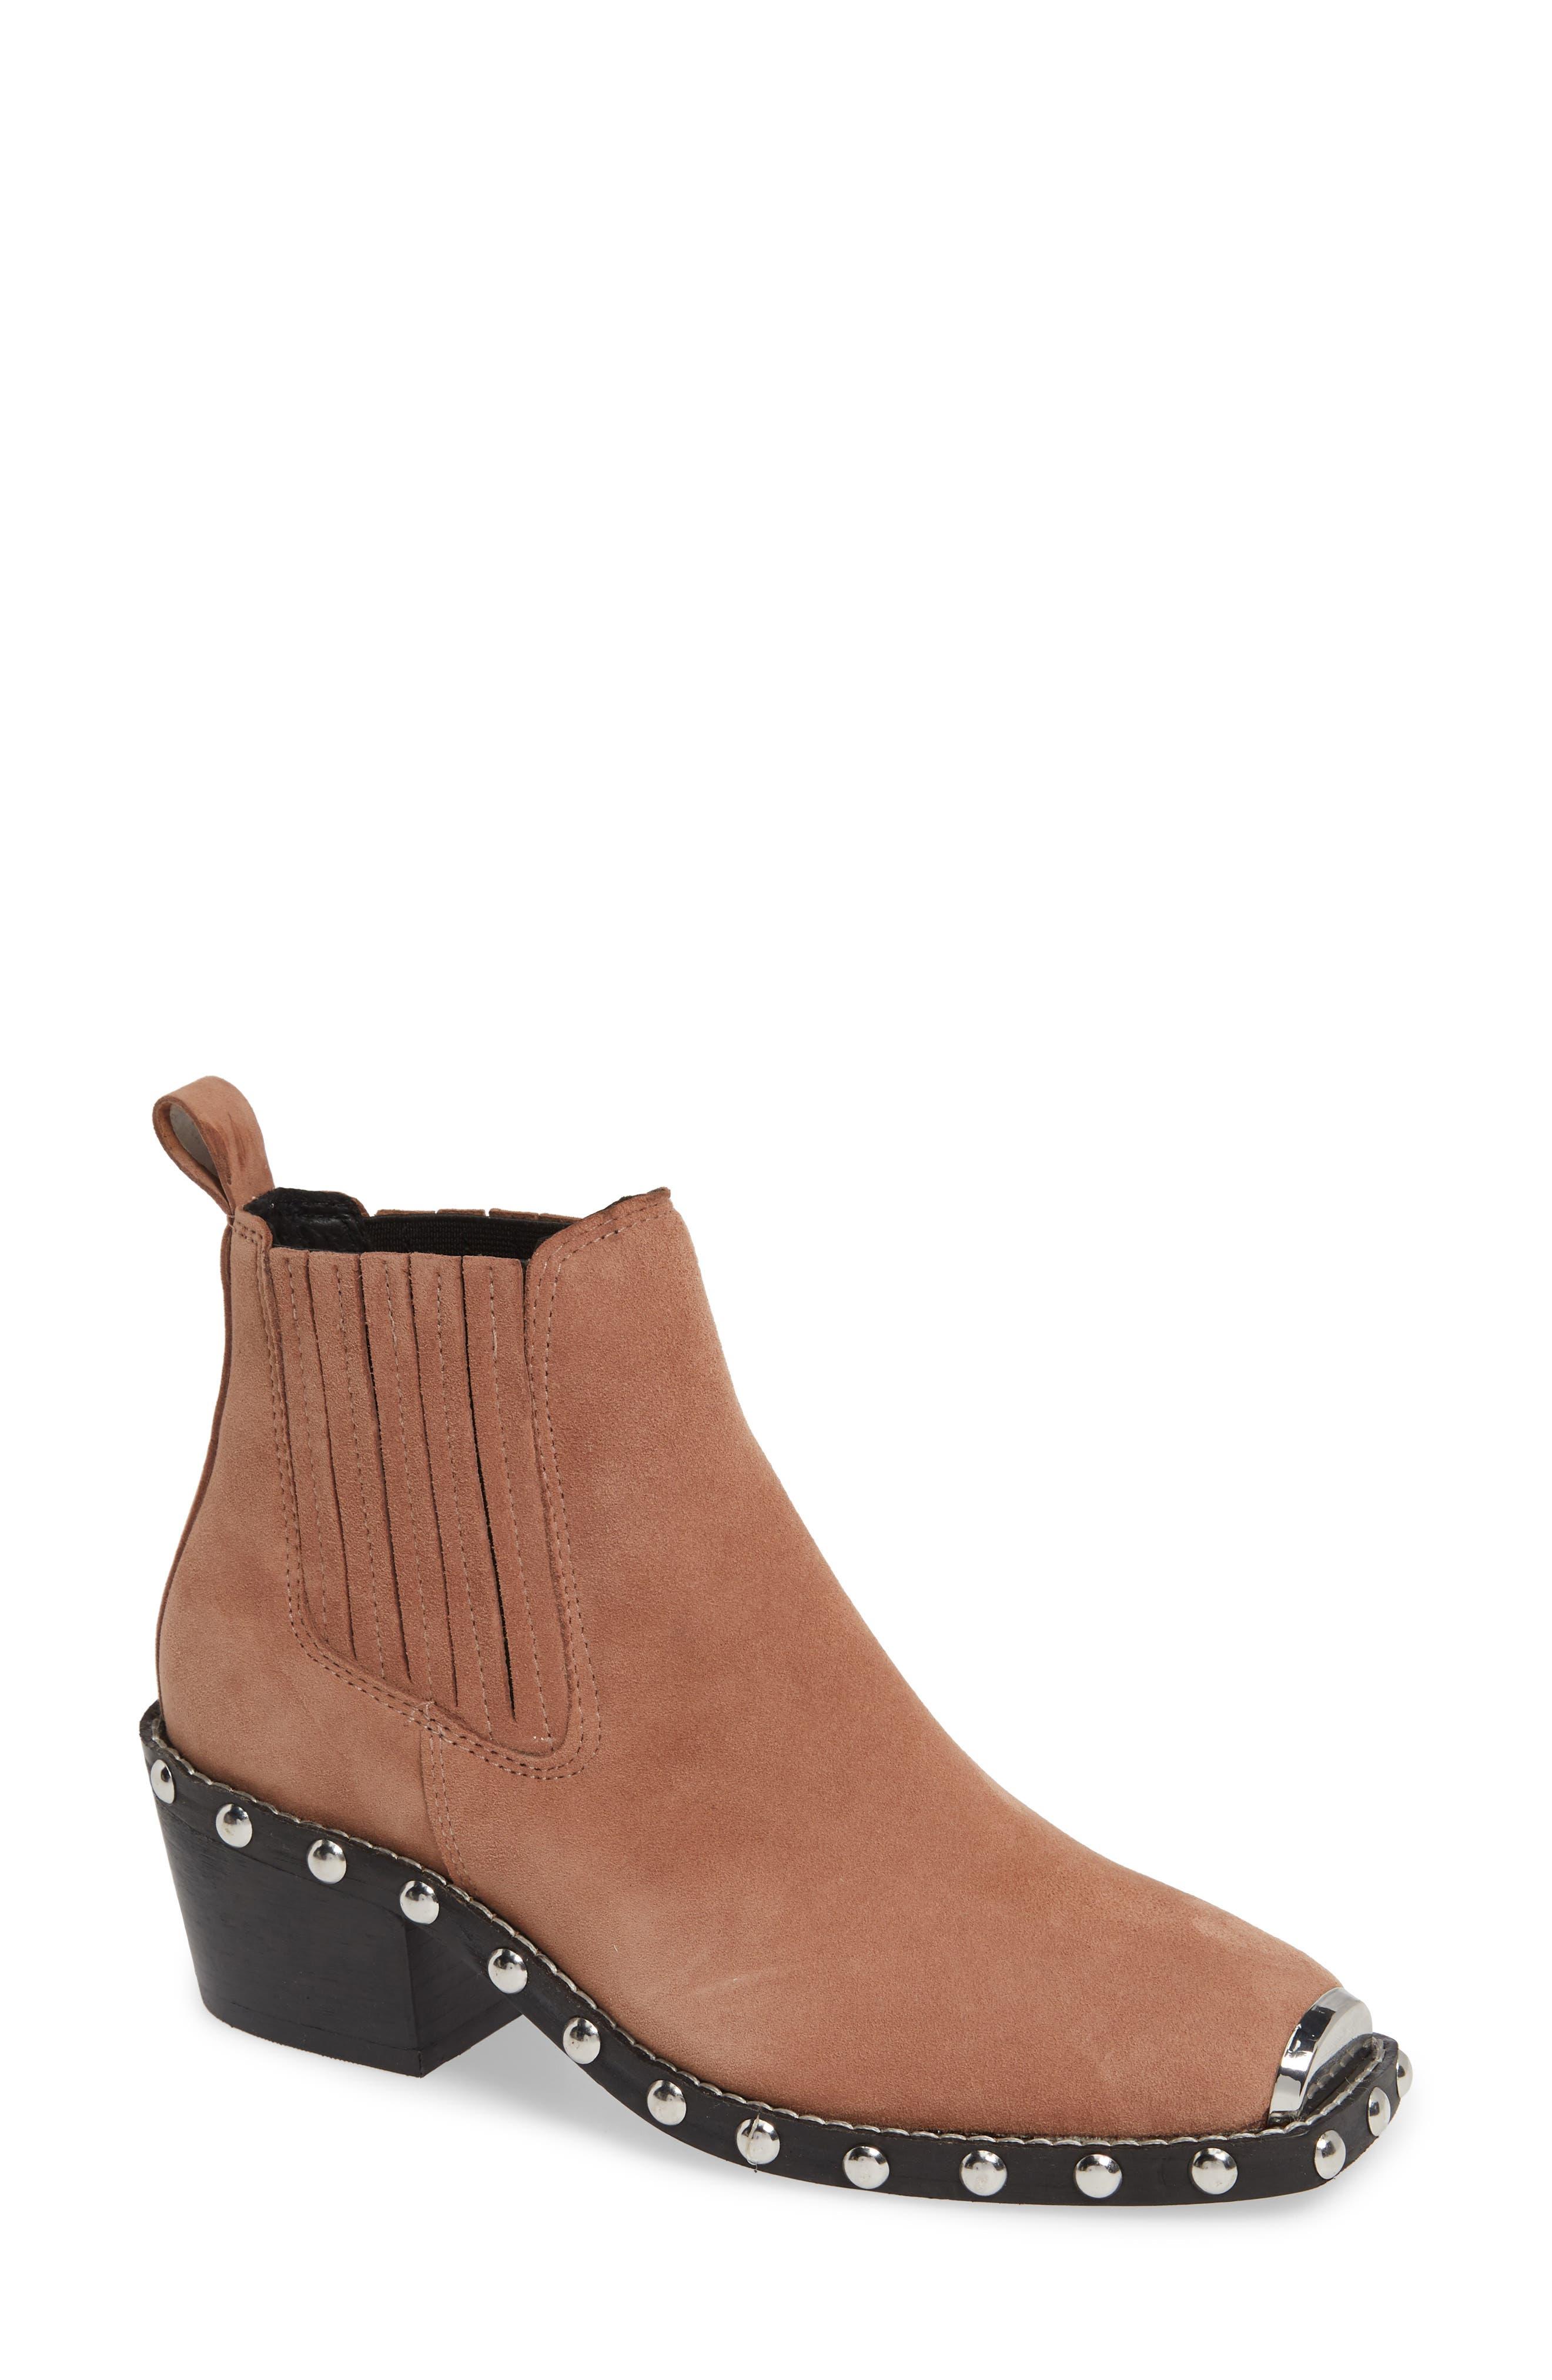 Topshop Alana Stud Ankle Bootie- Brown